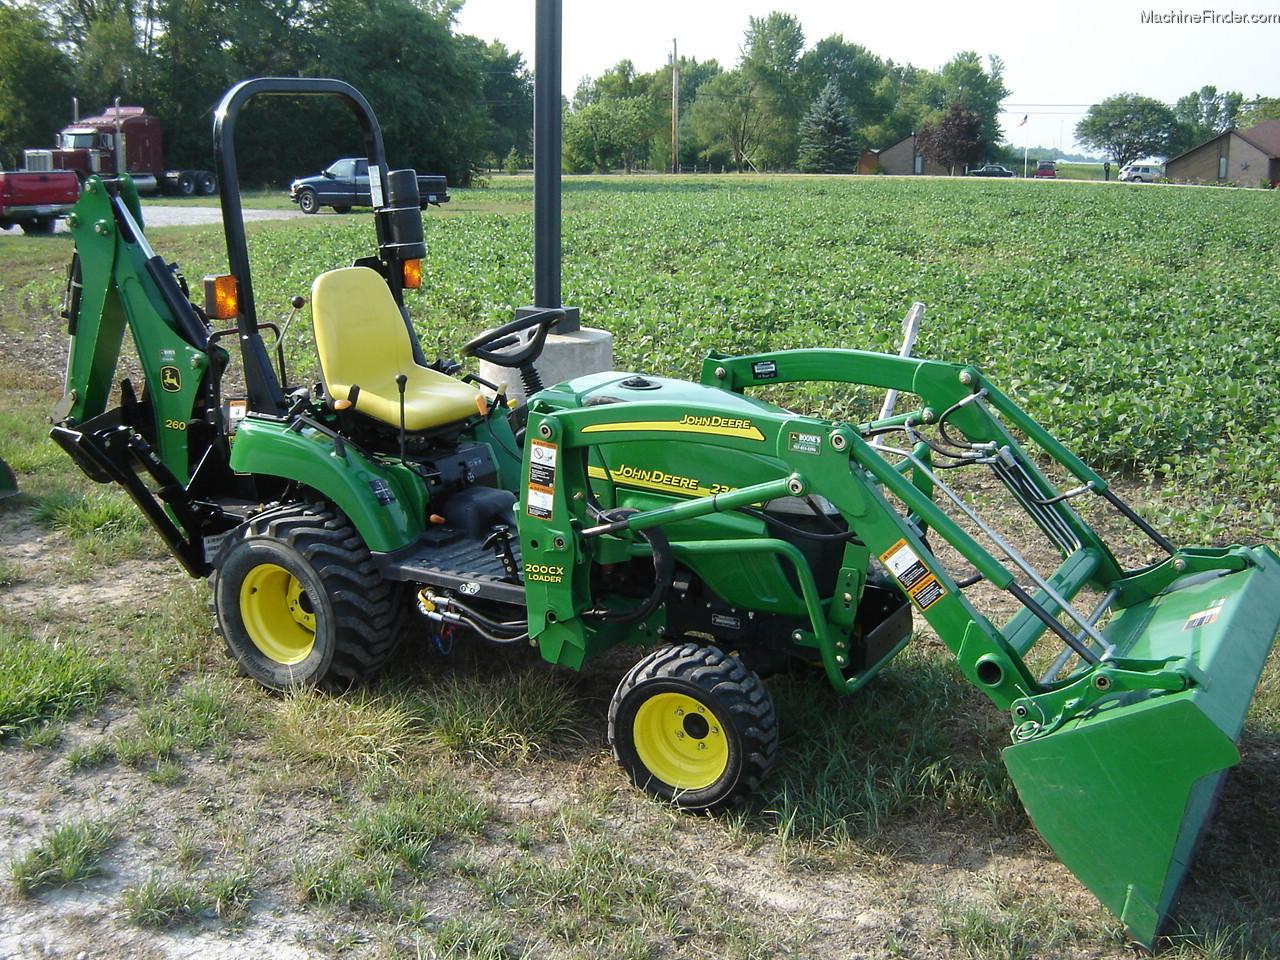 2009 John Deere 2305 Tractors - Compact (1-40hp.) - John ...